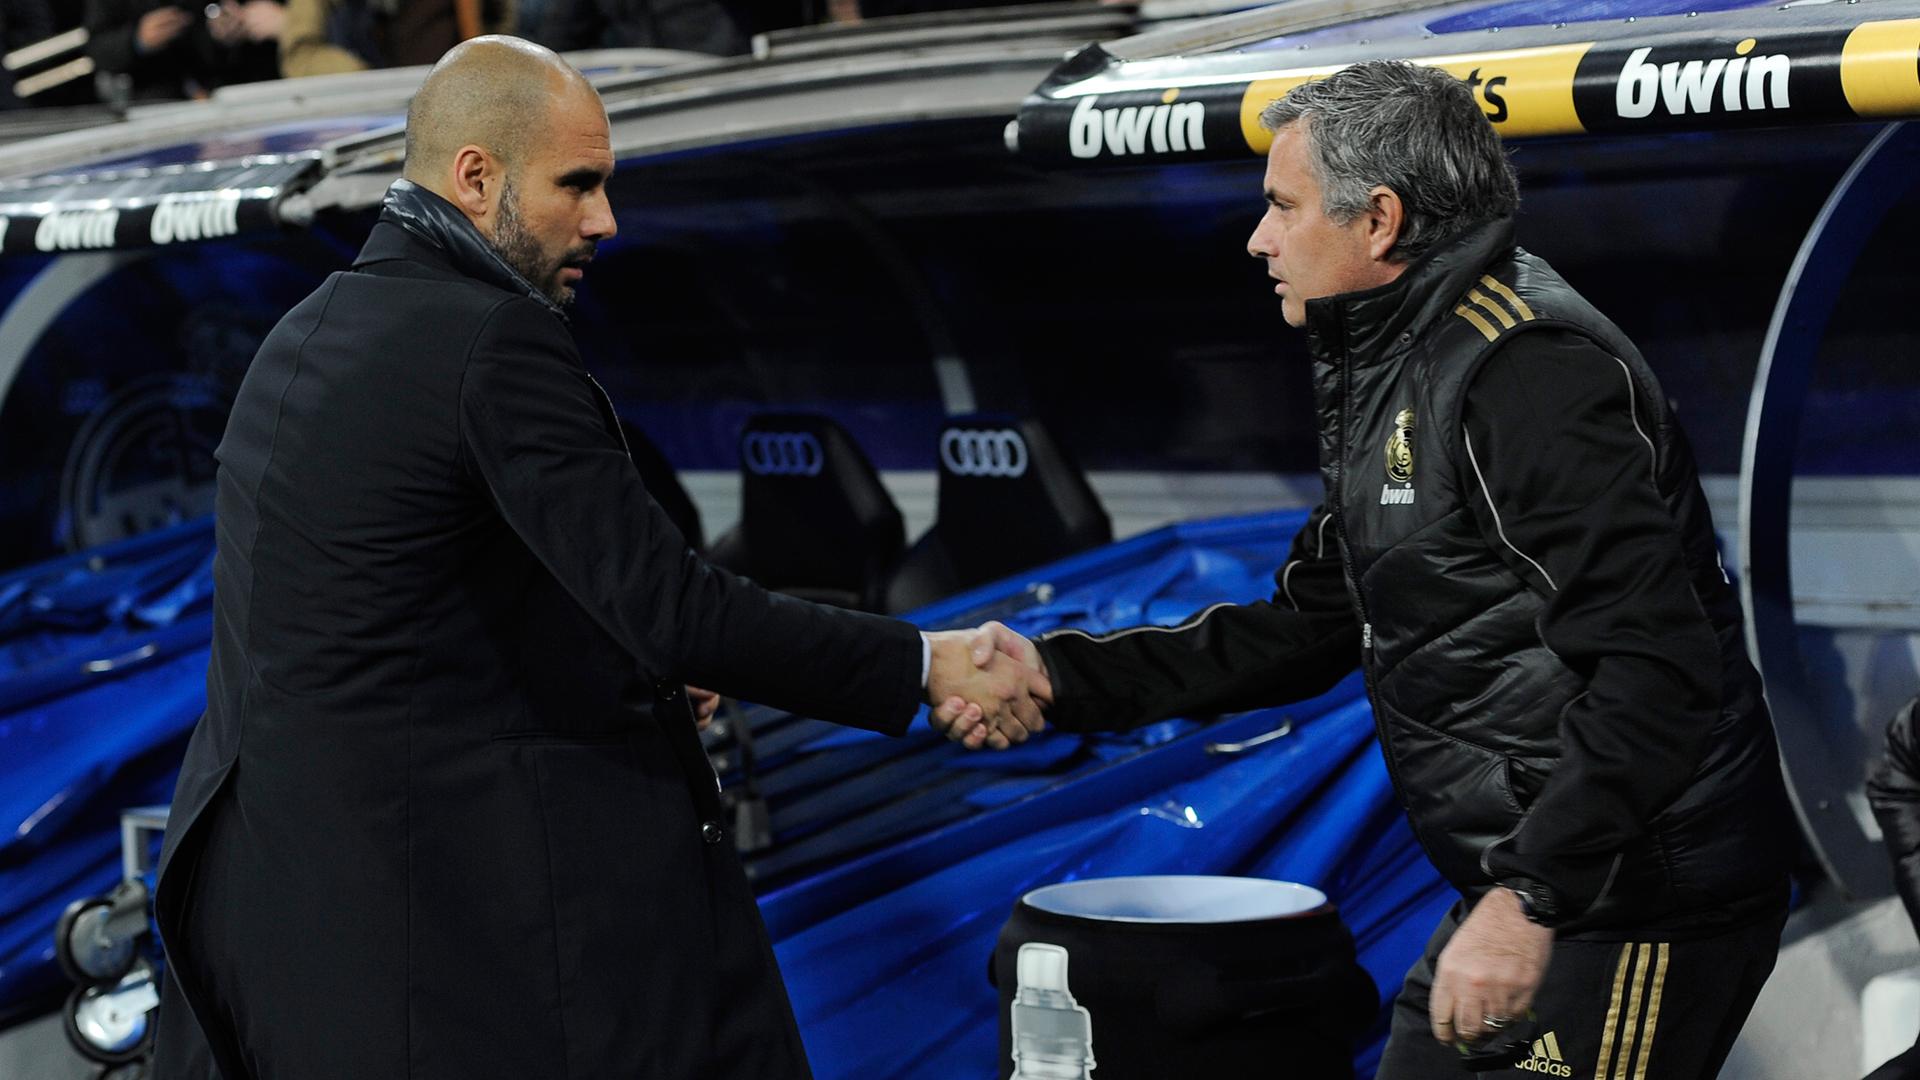 Manchester United gaffer Jose Mourinho reassures injured duo Chris Smalling, Phil Jones